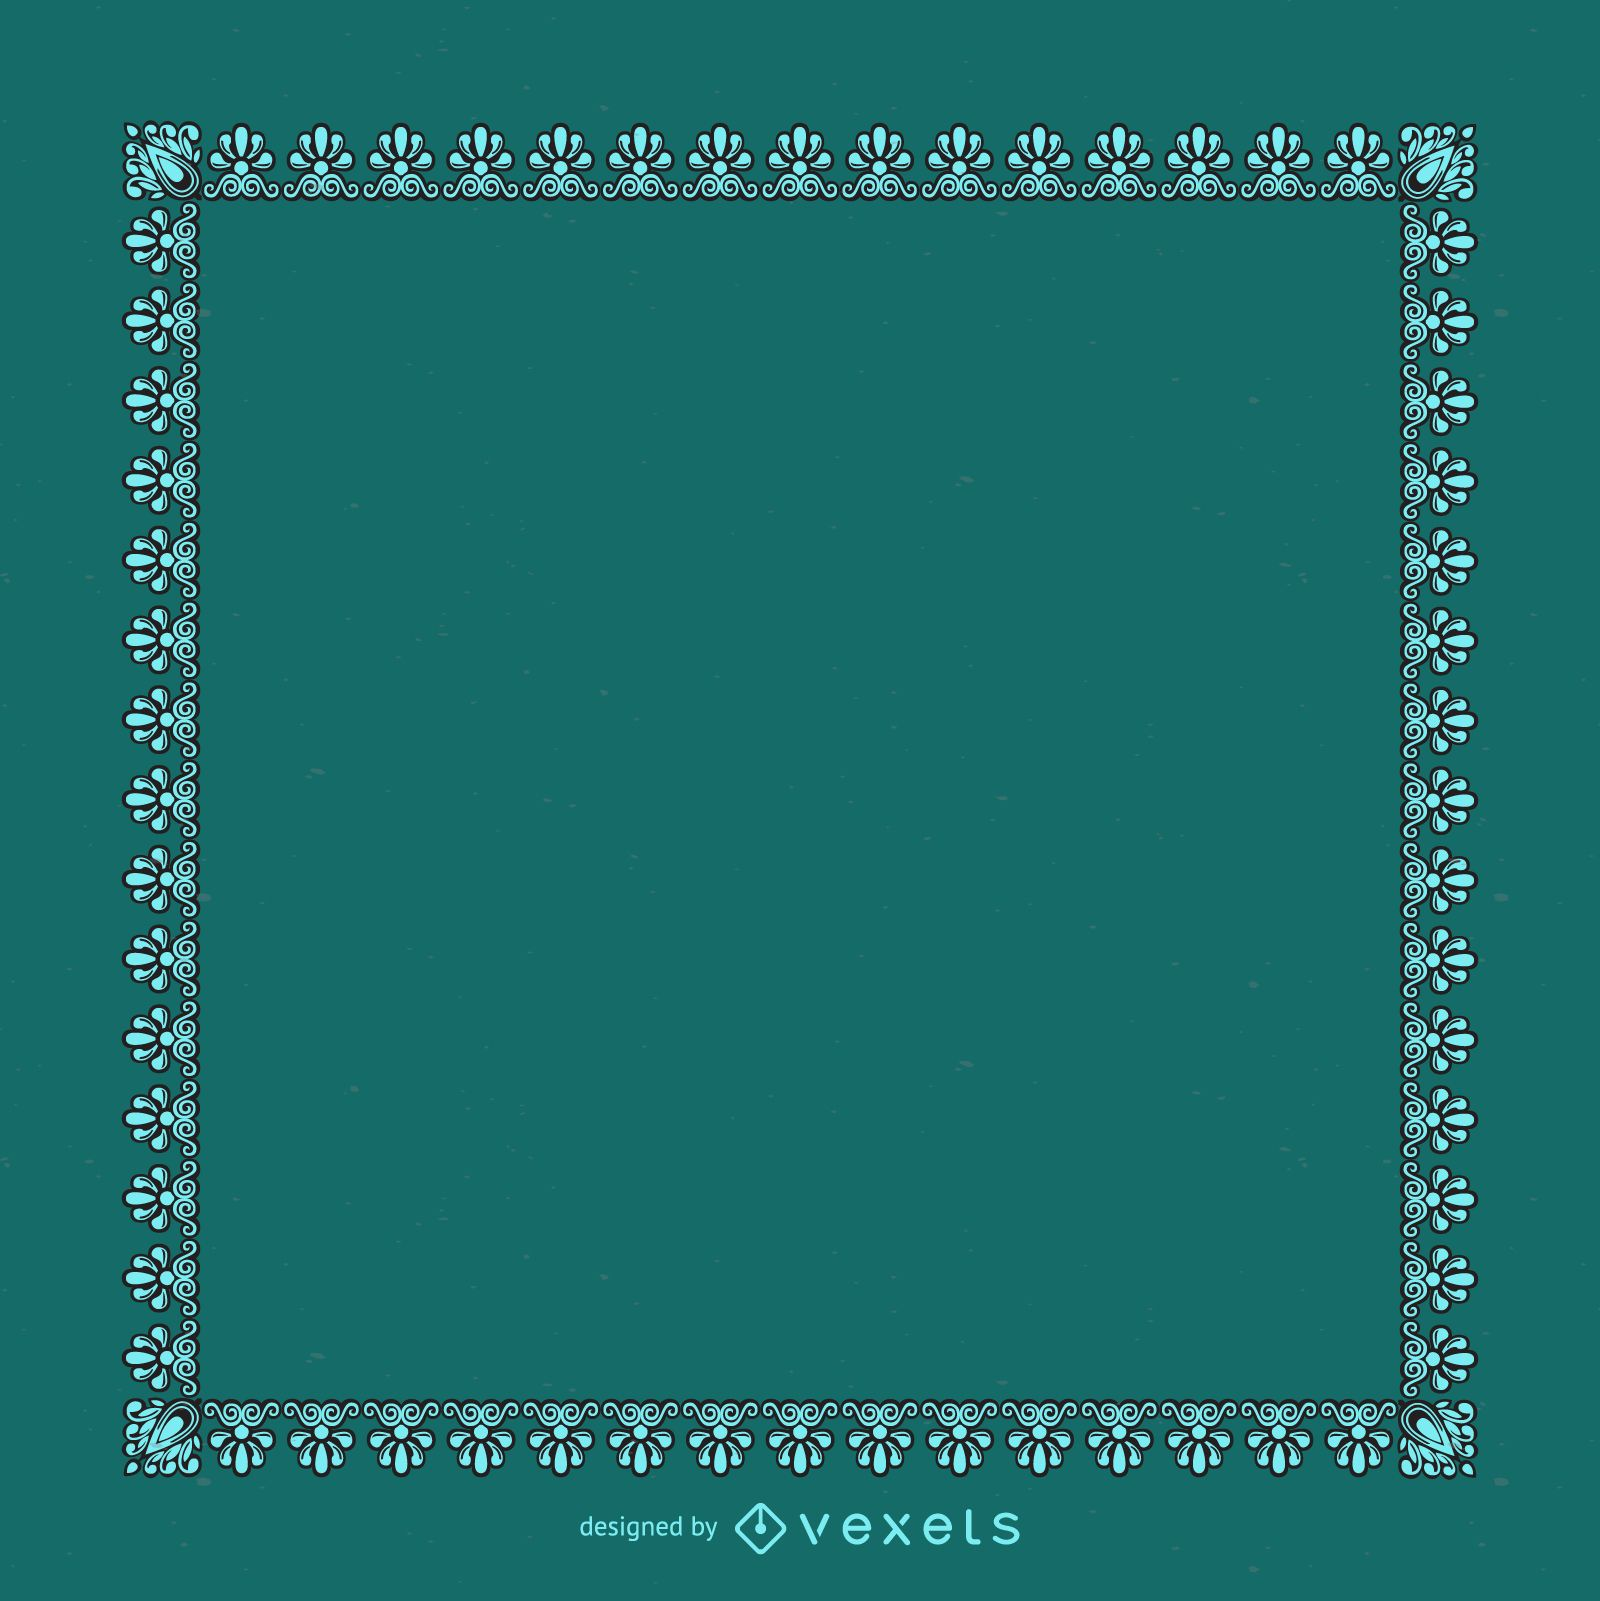 Elegant blue decorative frame